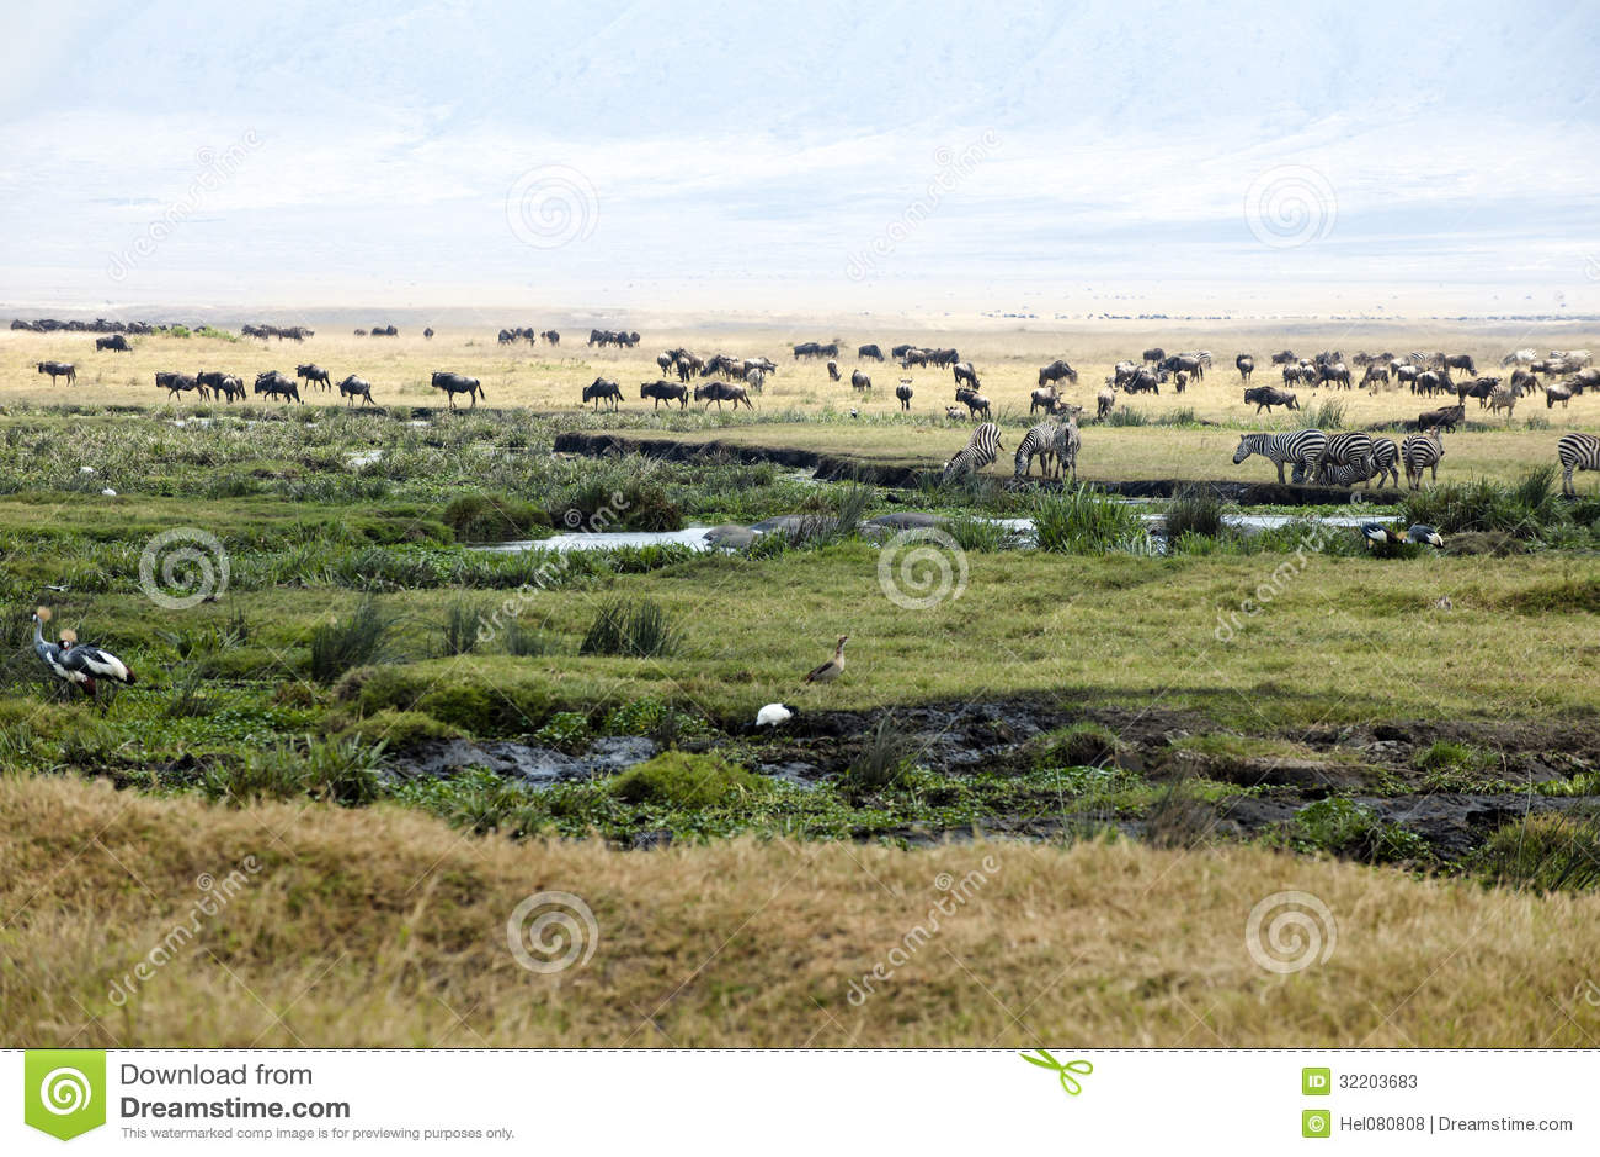 Zebras, Gnus, Αντιόχεια, πουλιά στον κρατήρα Ngorongoro